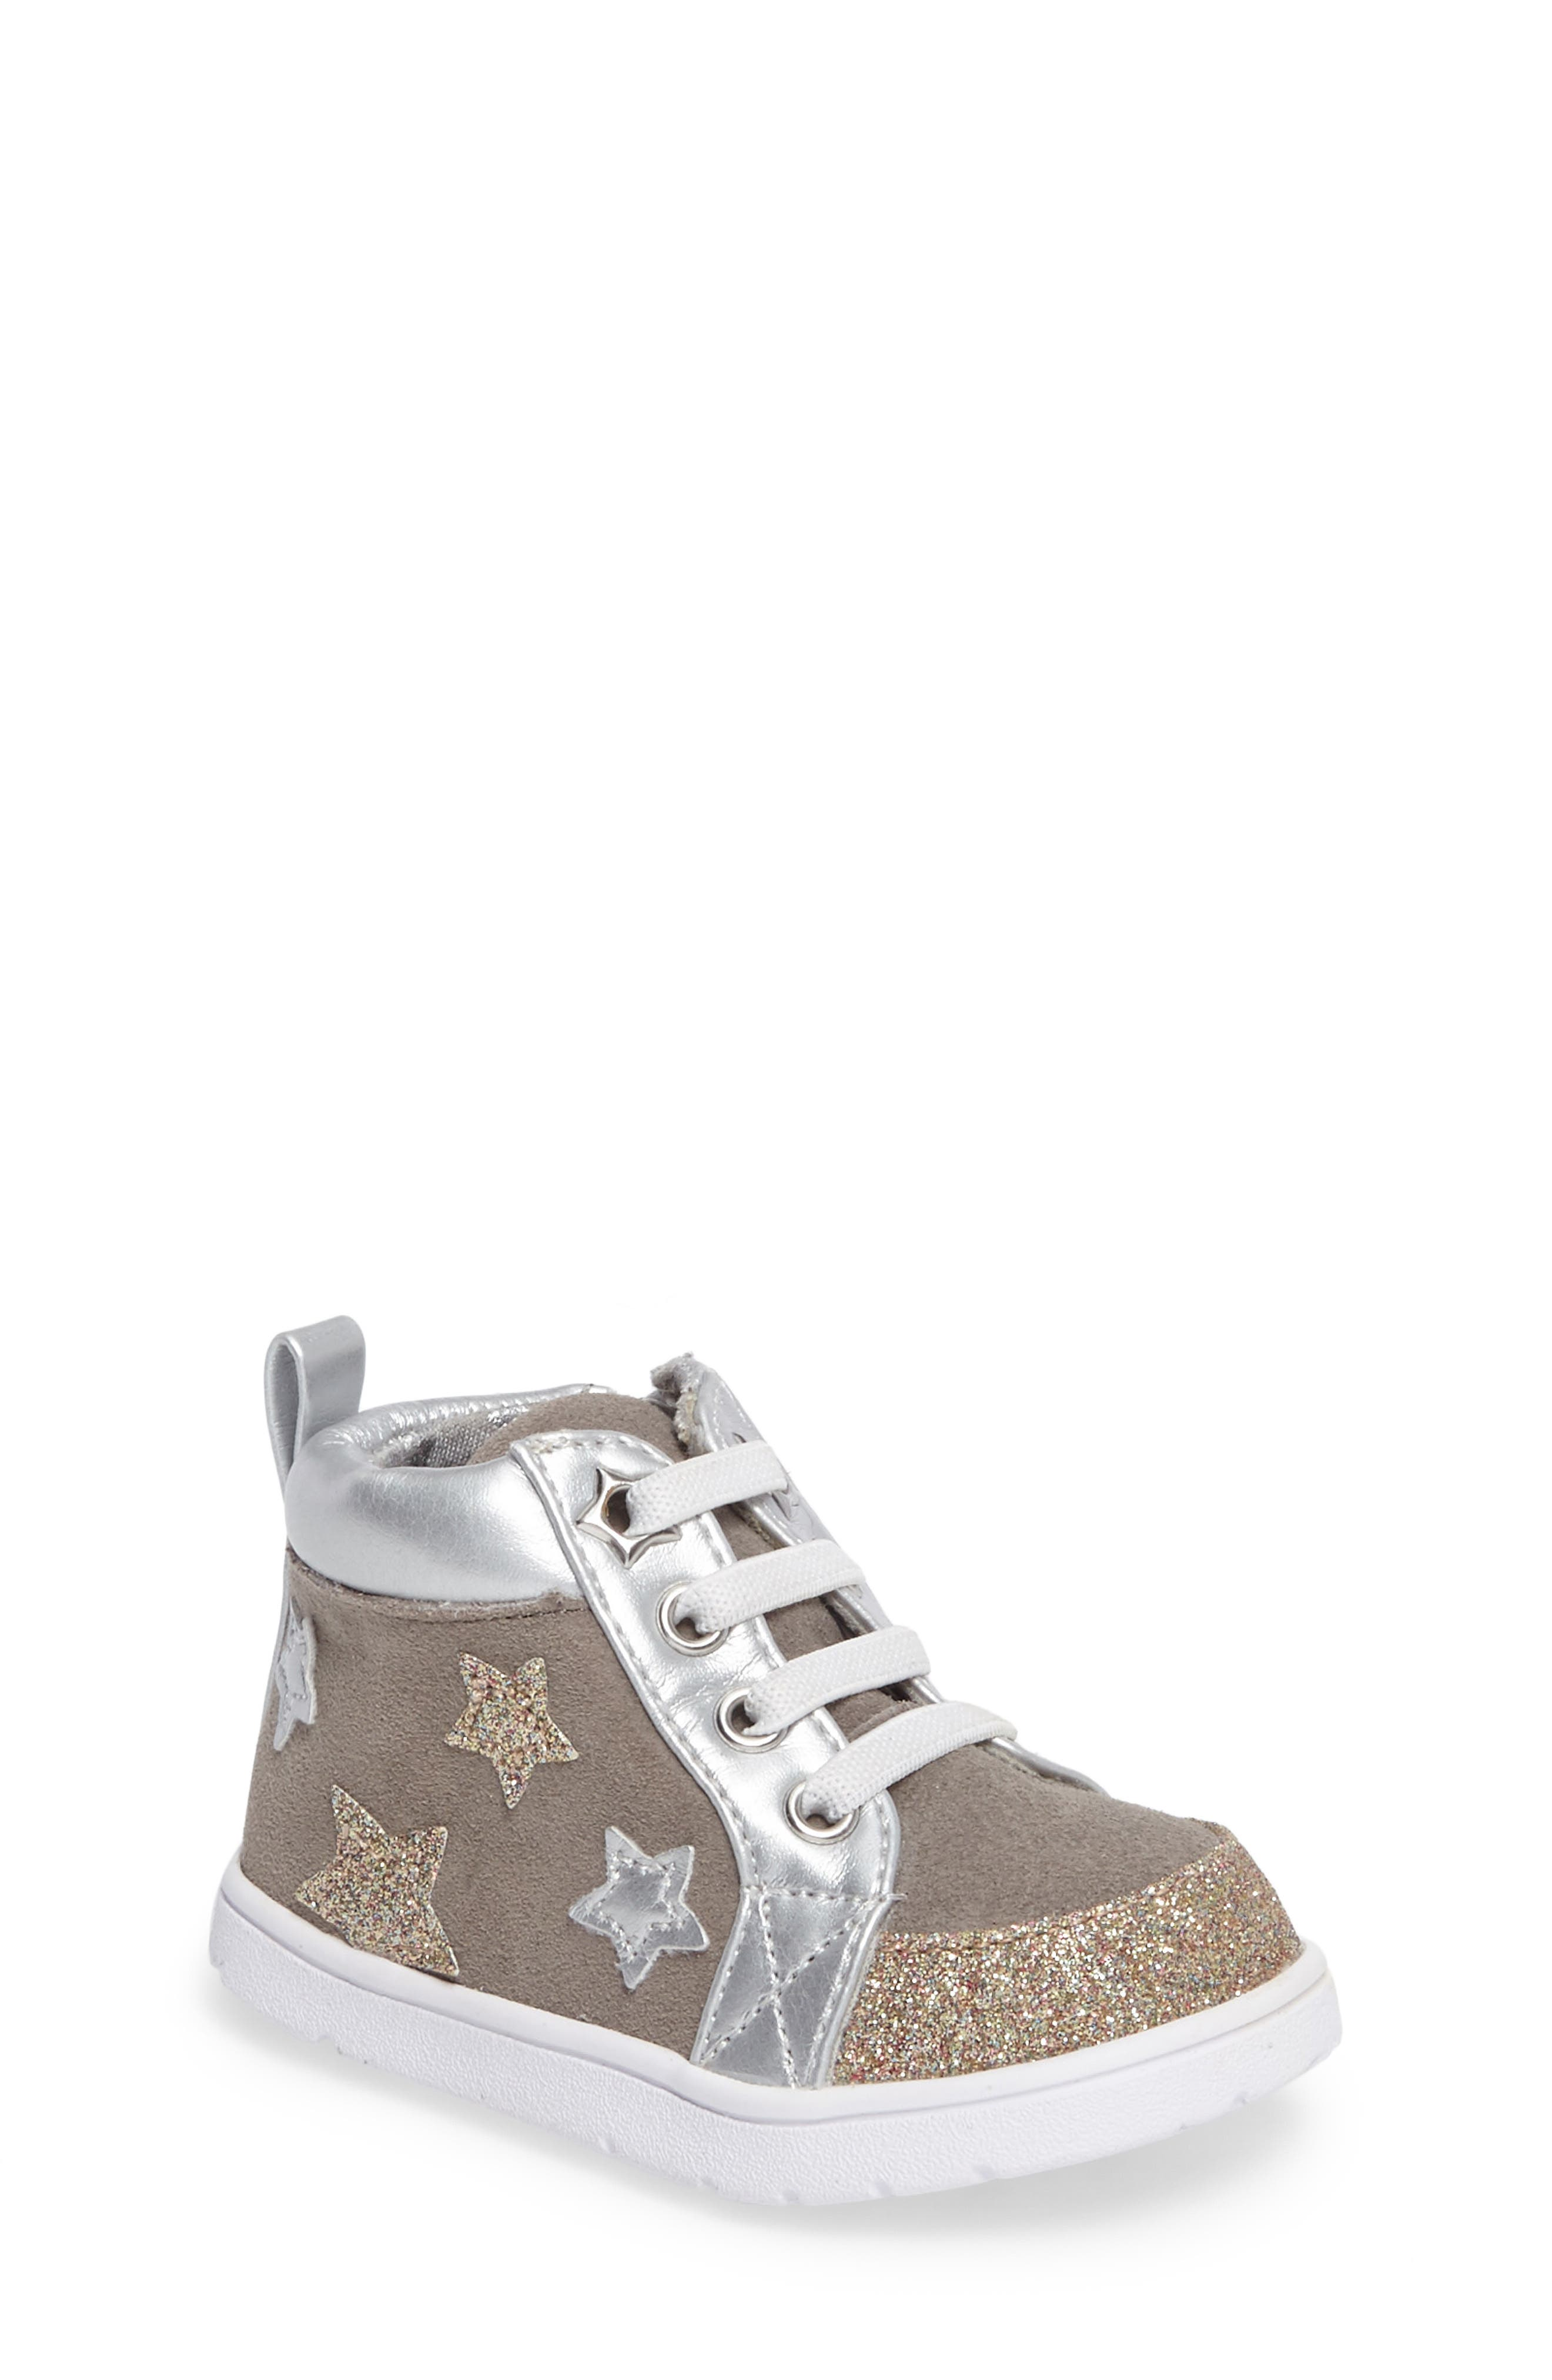 Diantha Star Appliqué High Top Sneaker,                             Main thumbnail 1, color,                             020